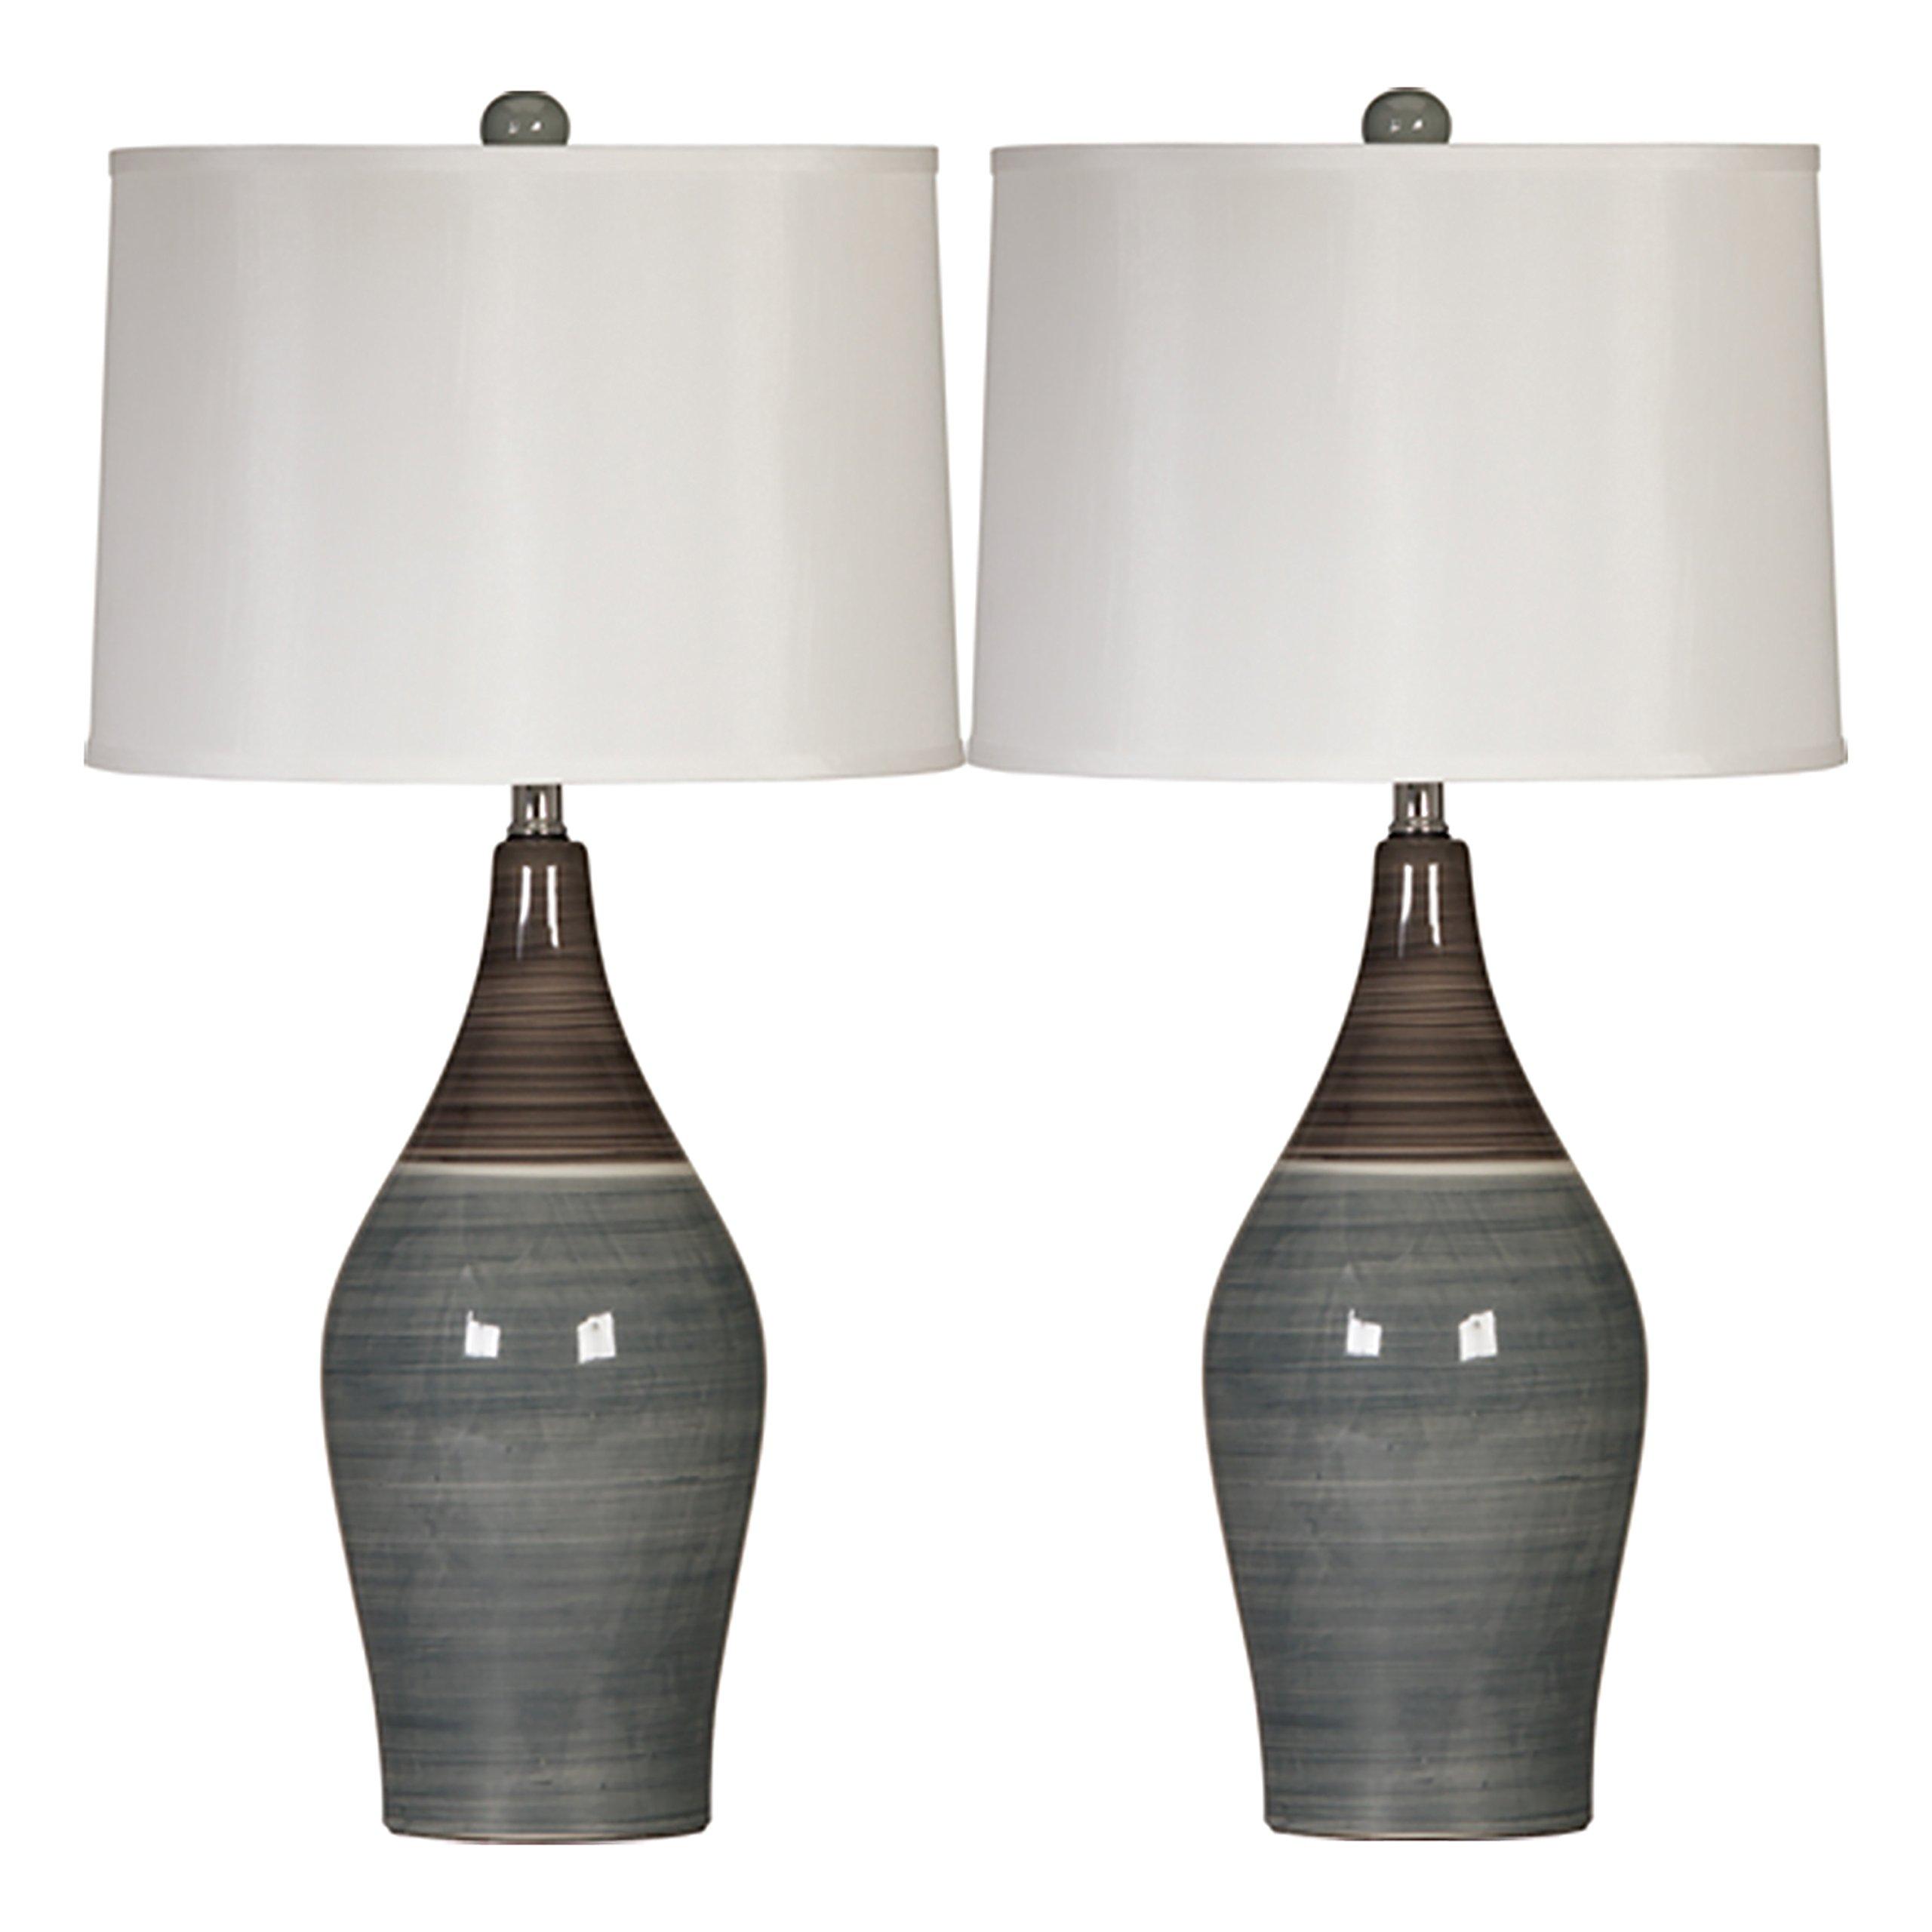 Ashley Furniture Signature Design -  Niobe Ceramic Table Lamp - Set of 2 - Multicolored/Gray by Signature Design by Ashley (Image #1)